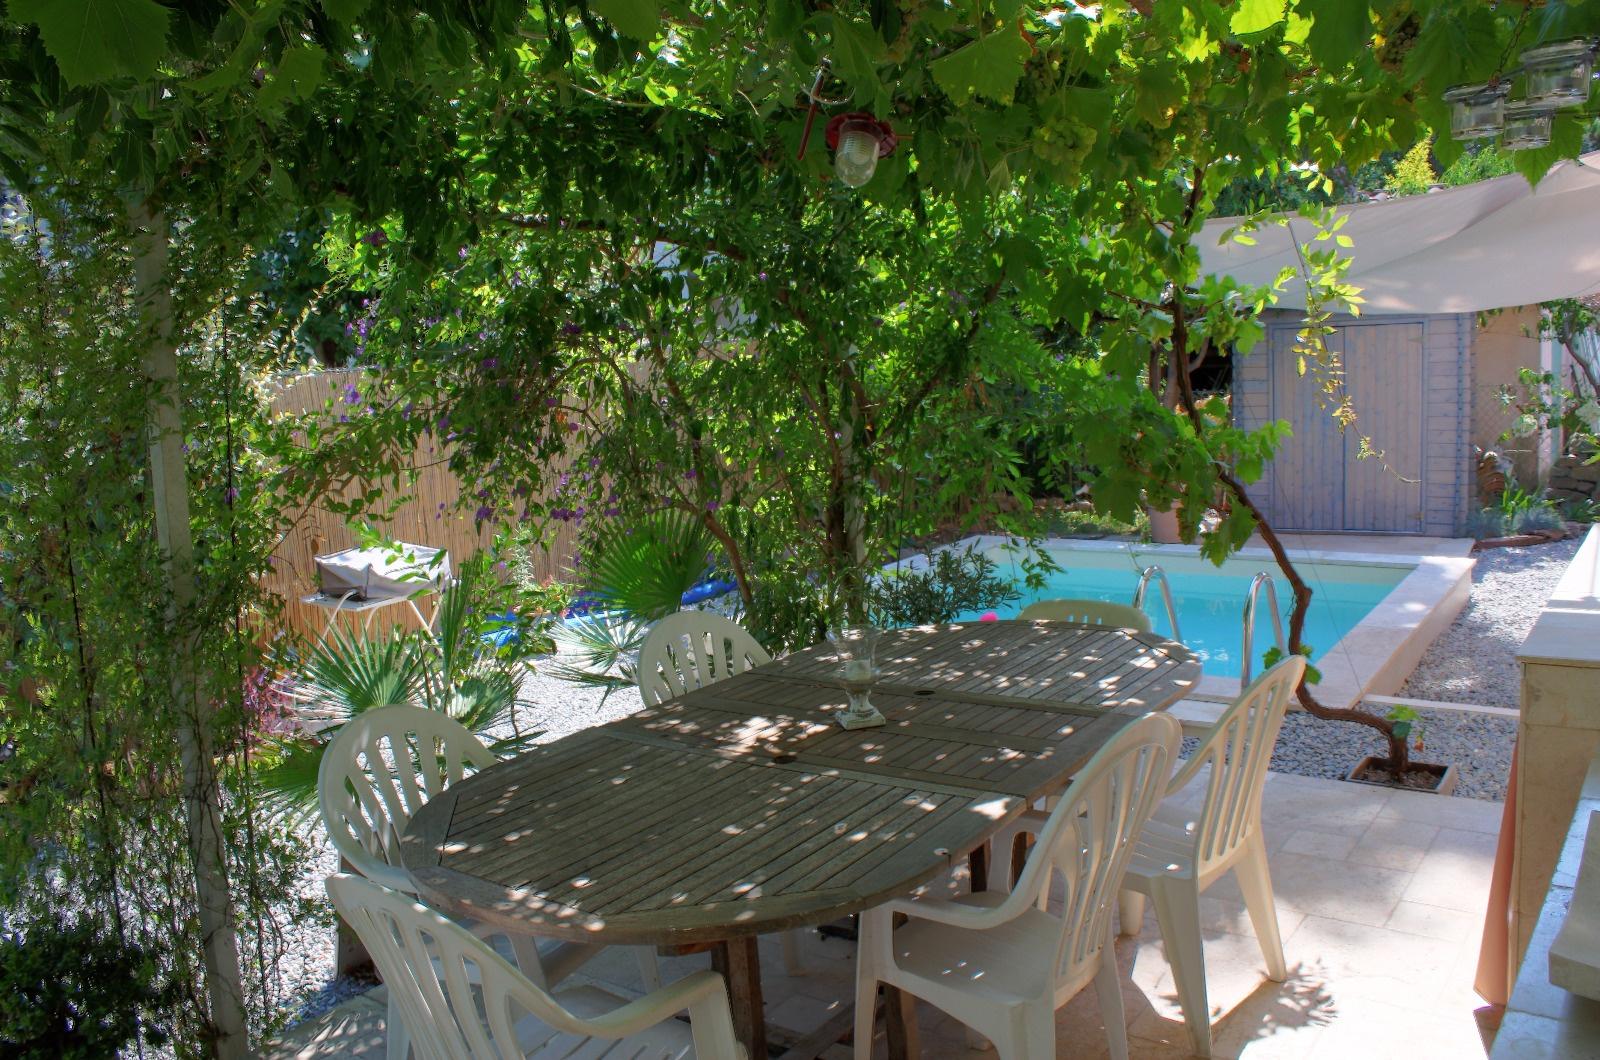 Vente rare appartement avec jardin et piscine for Jardin 150m2